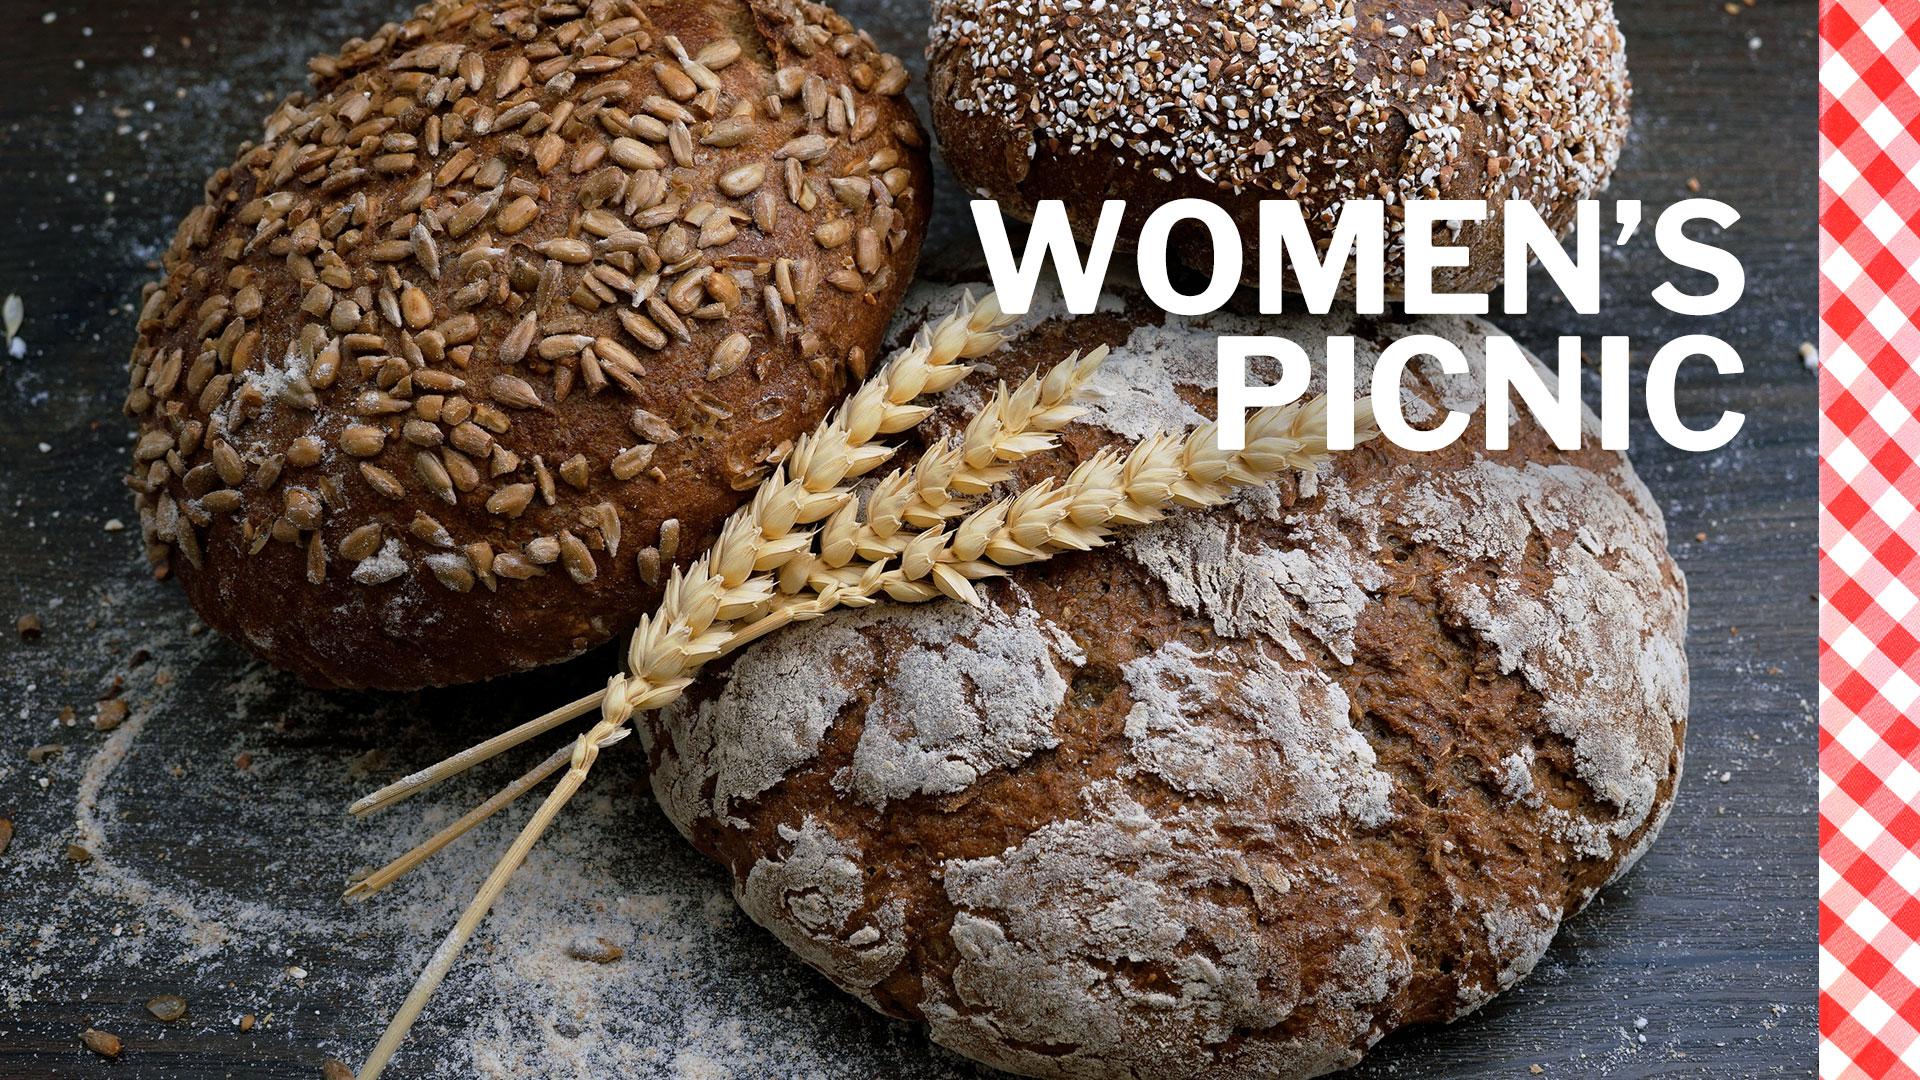 Women's Picnic logo